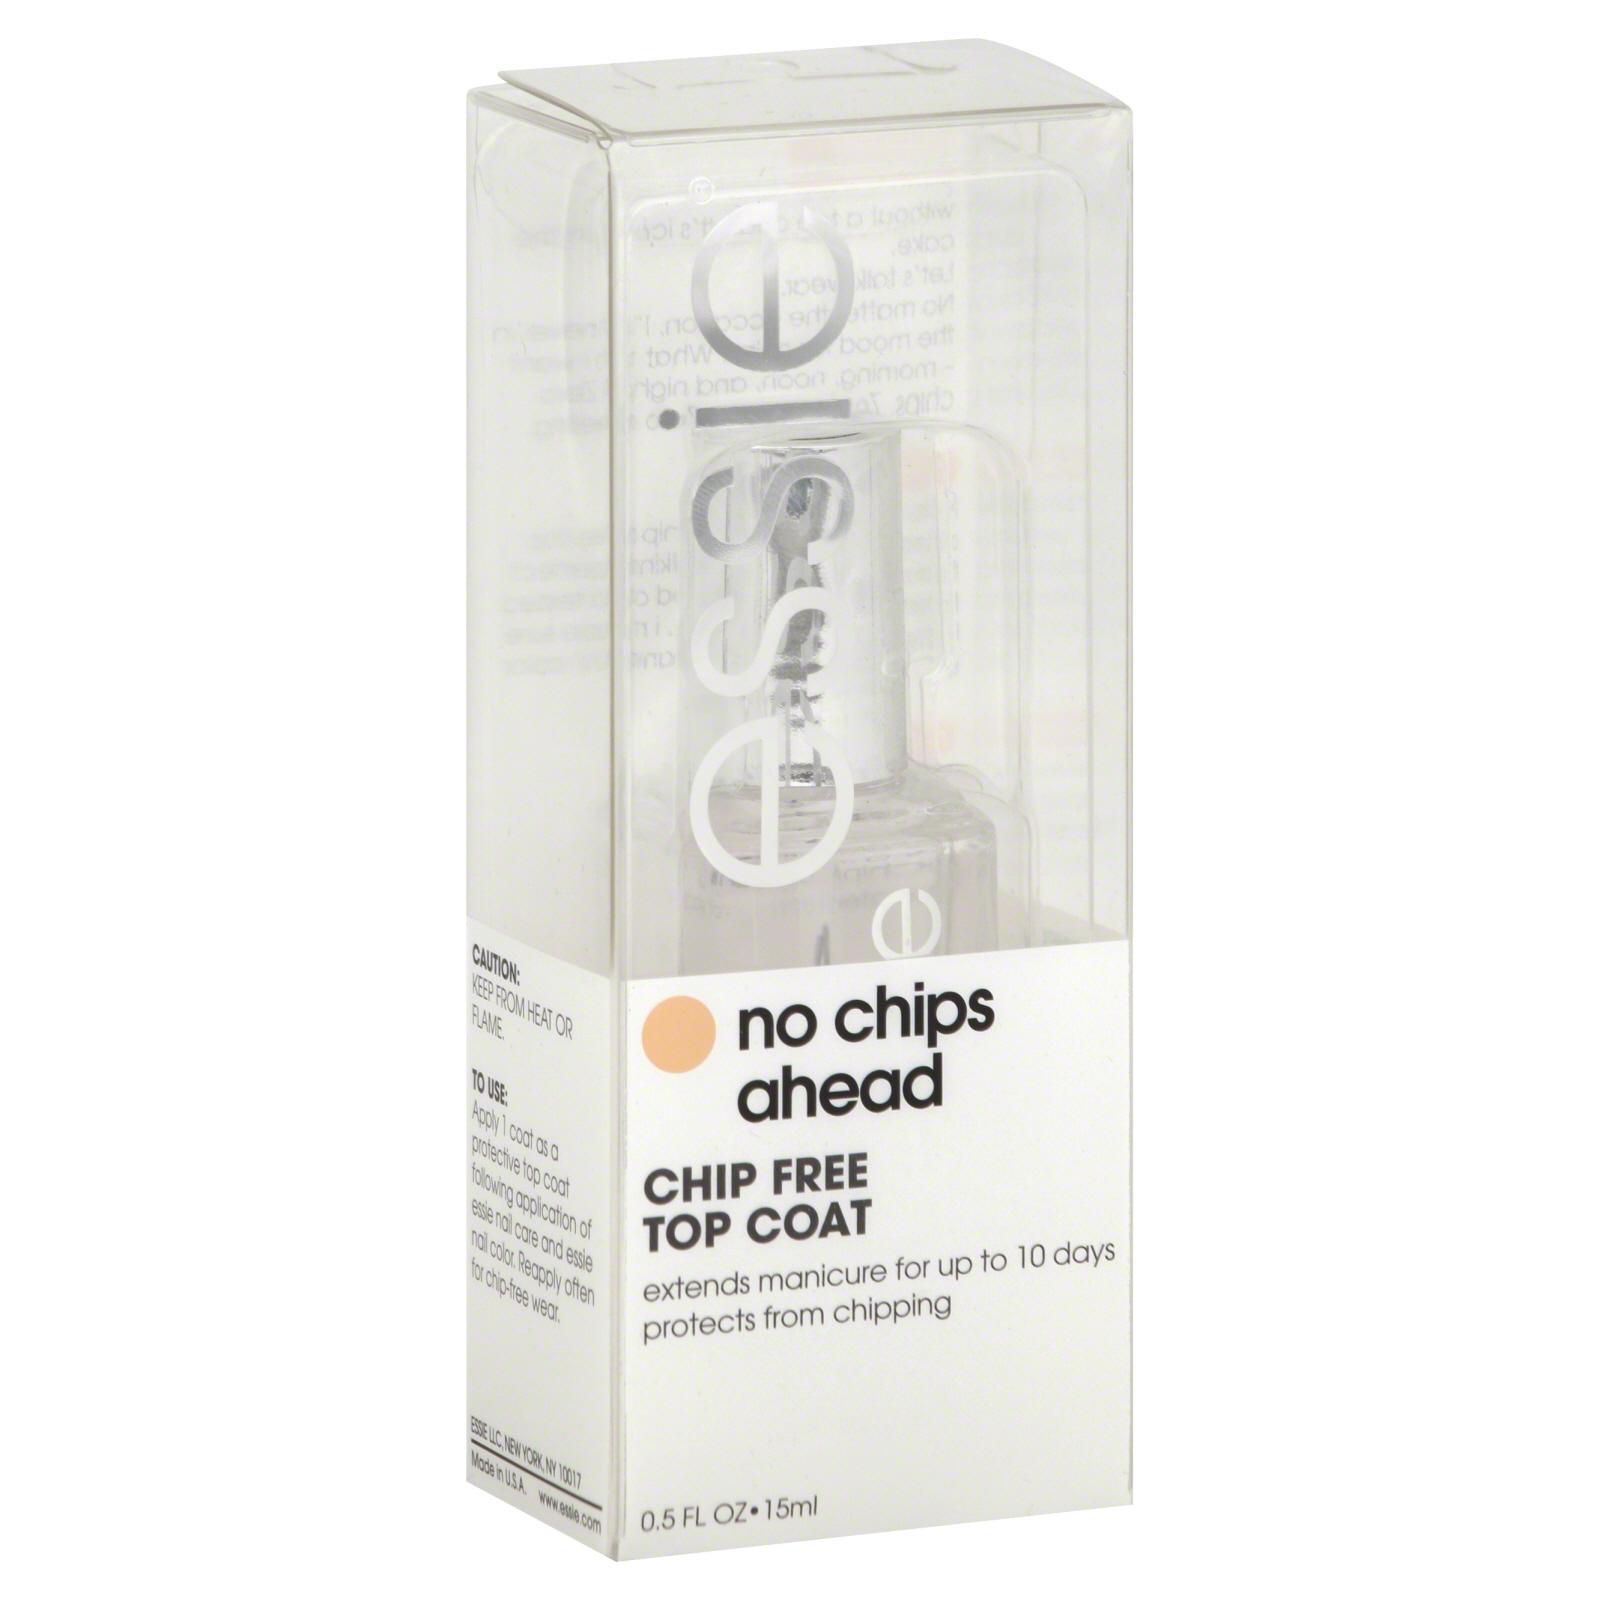 essie top coat chip free chips